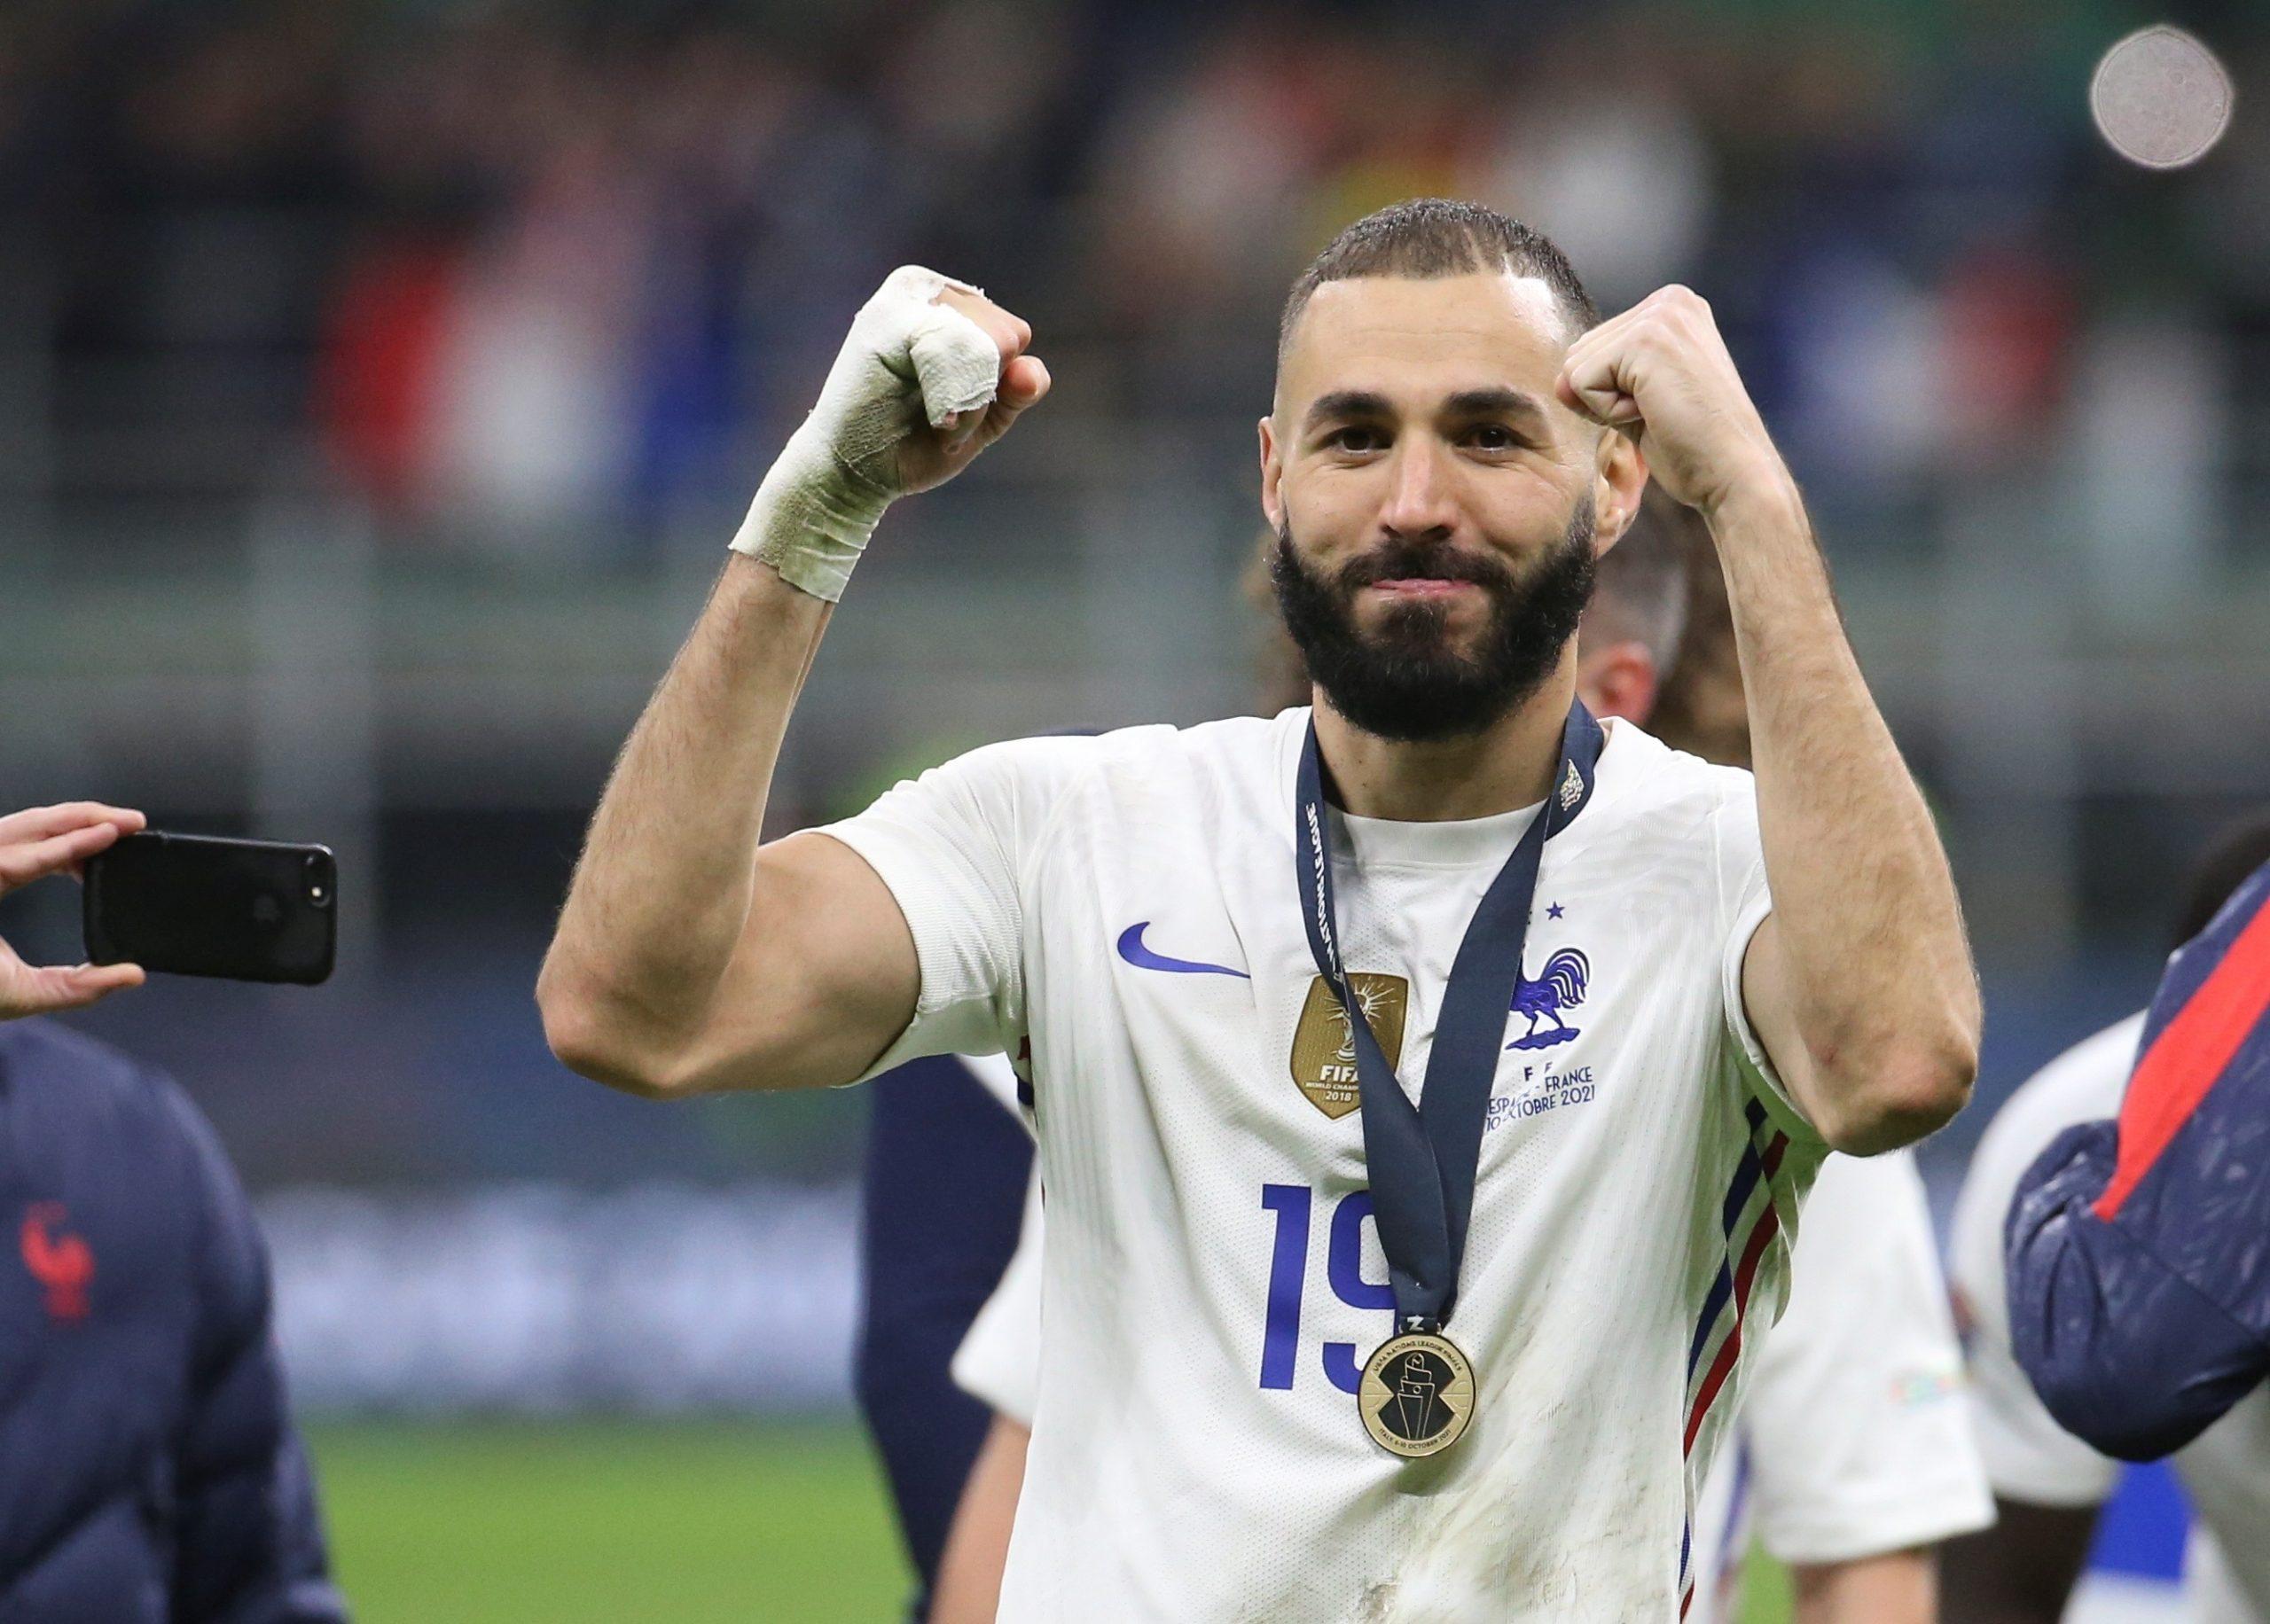 """Este equipo nunca se rinde"", dice Benzema de Francia - Prensa Libre"